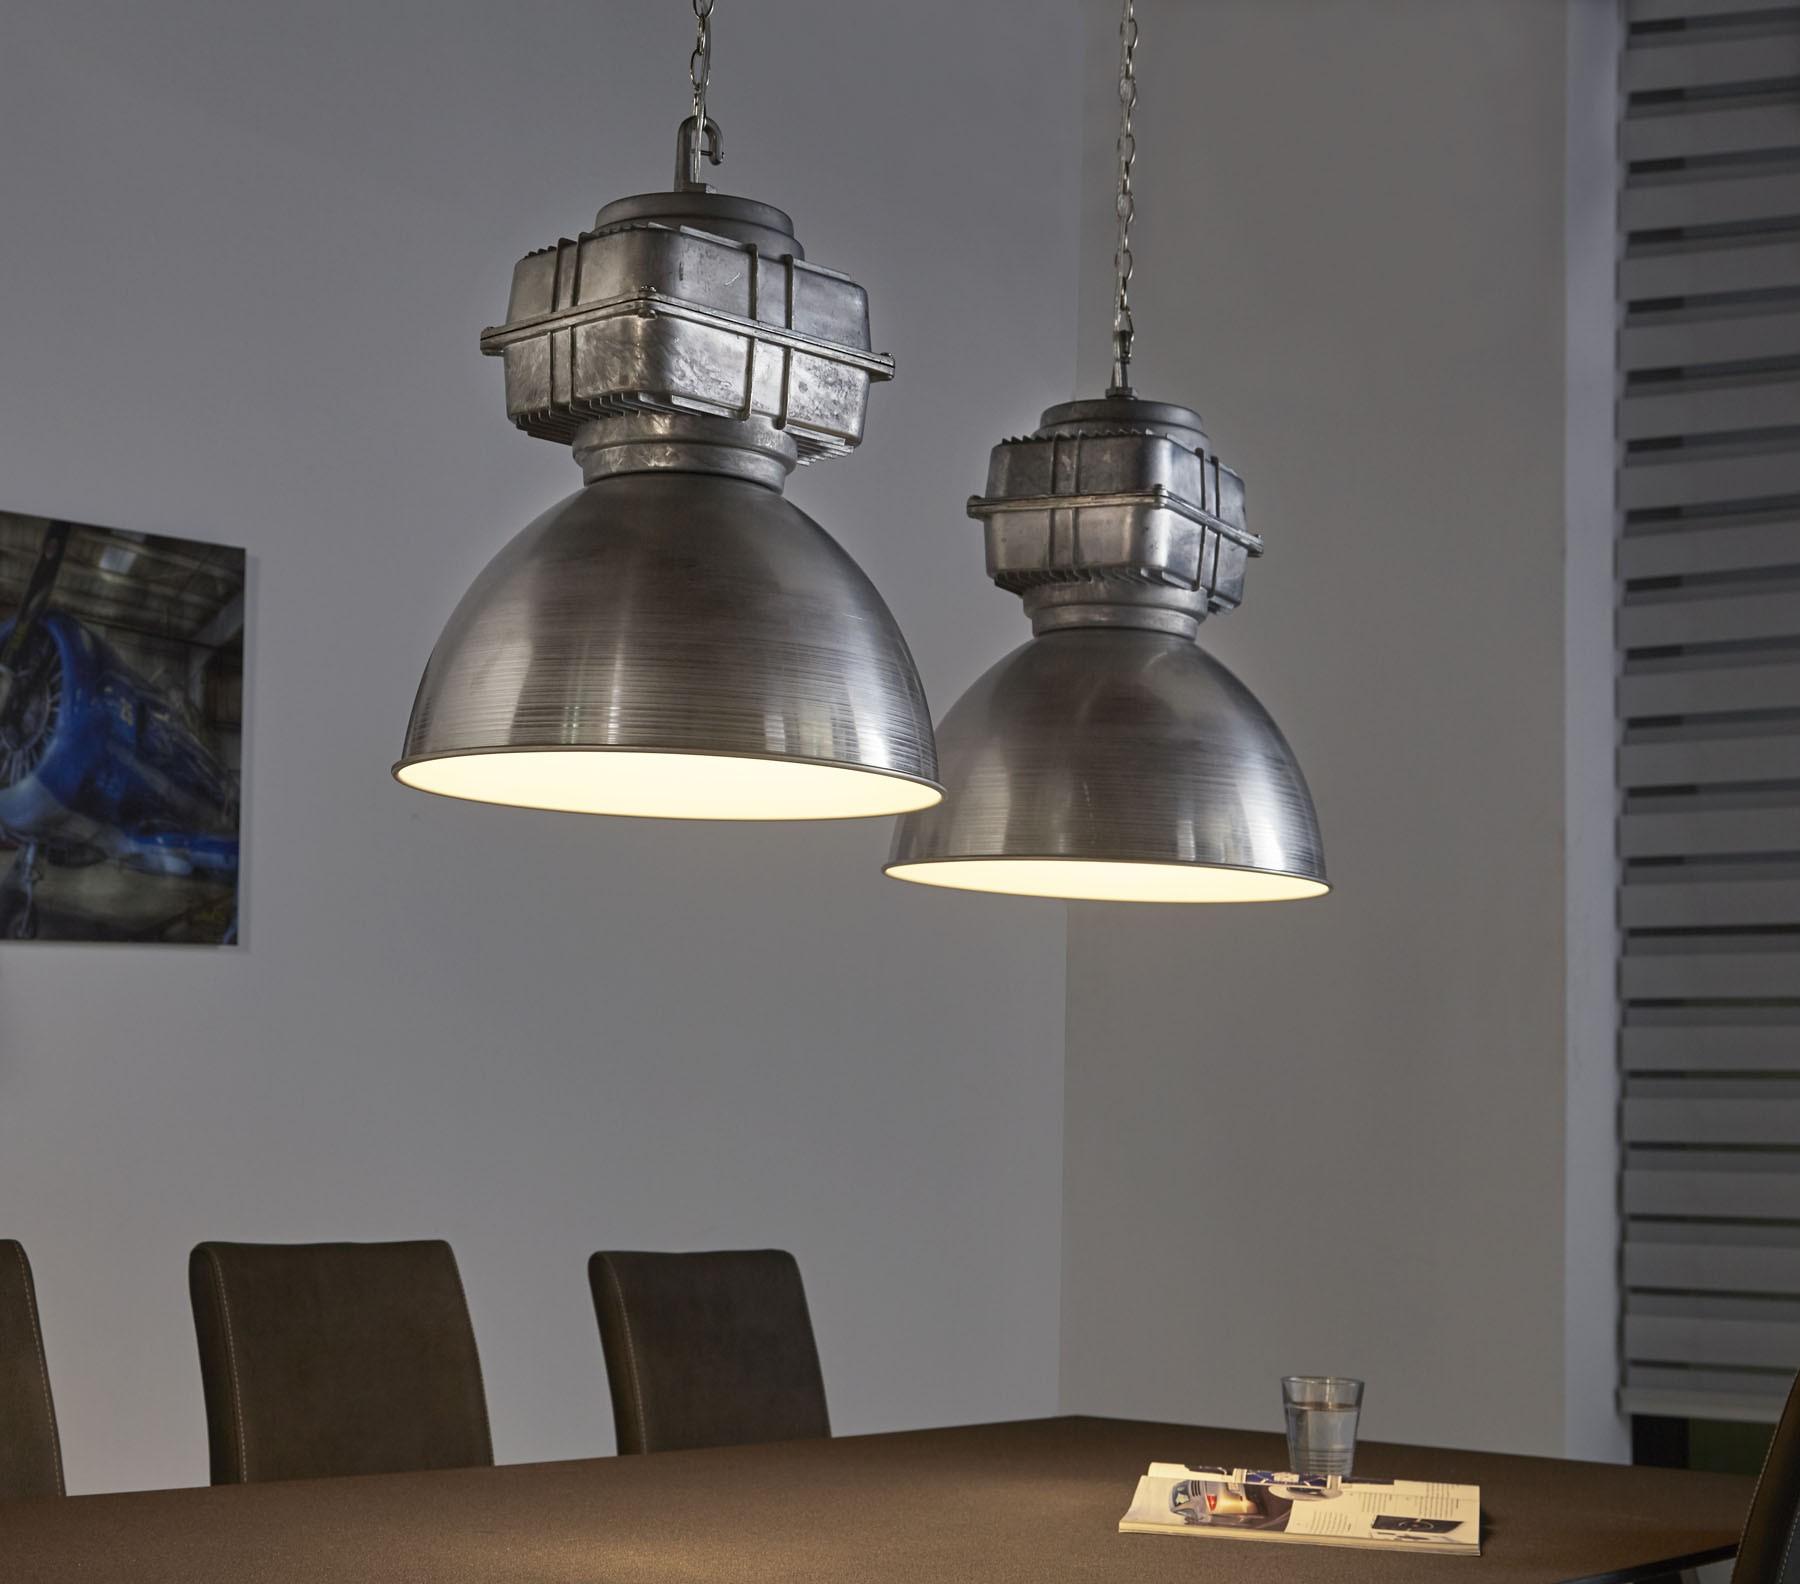 pendellampe metall industriedesign h ngelampe metall breite 110 cm. Black Bedroom Furniture Sets. Home Design Ideas